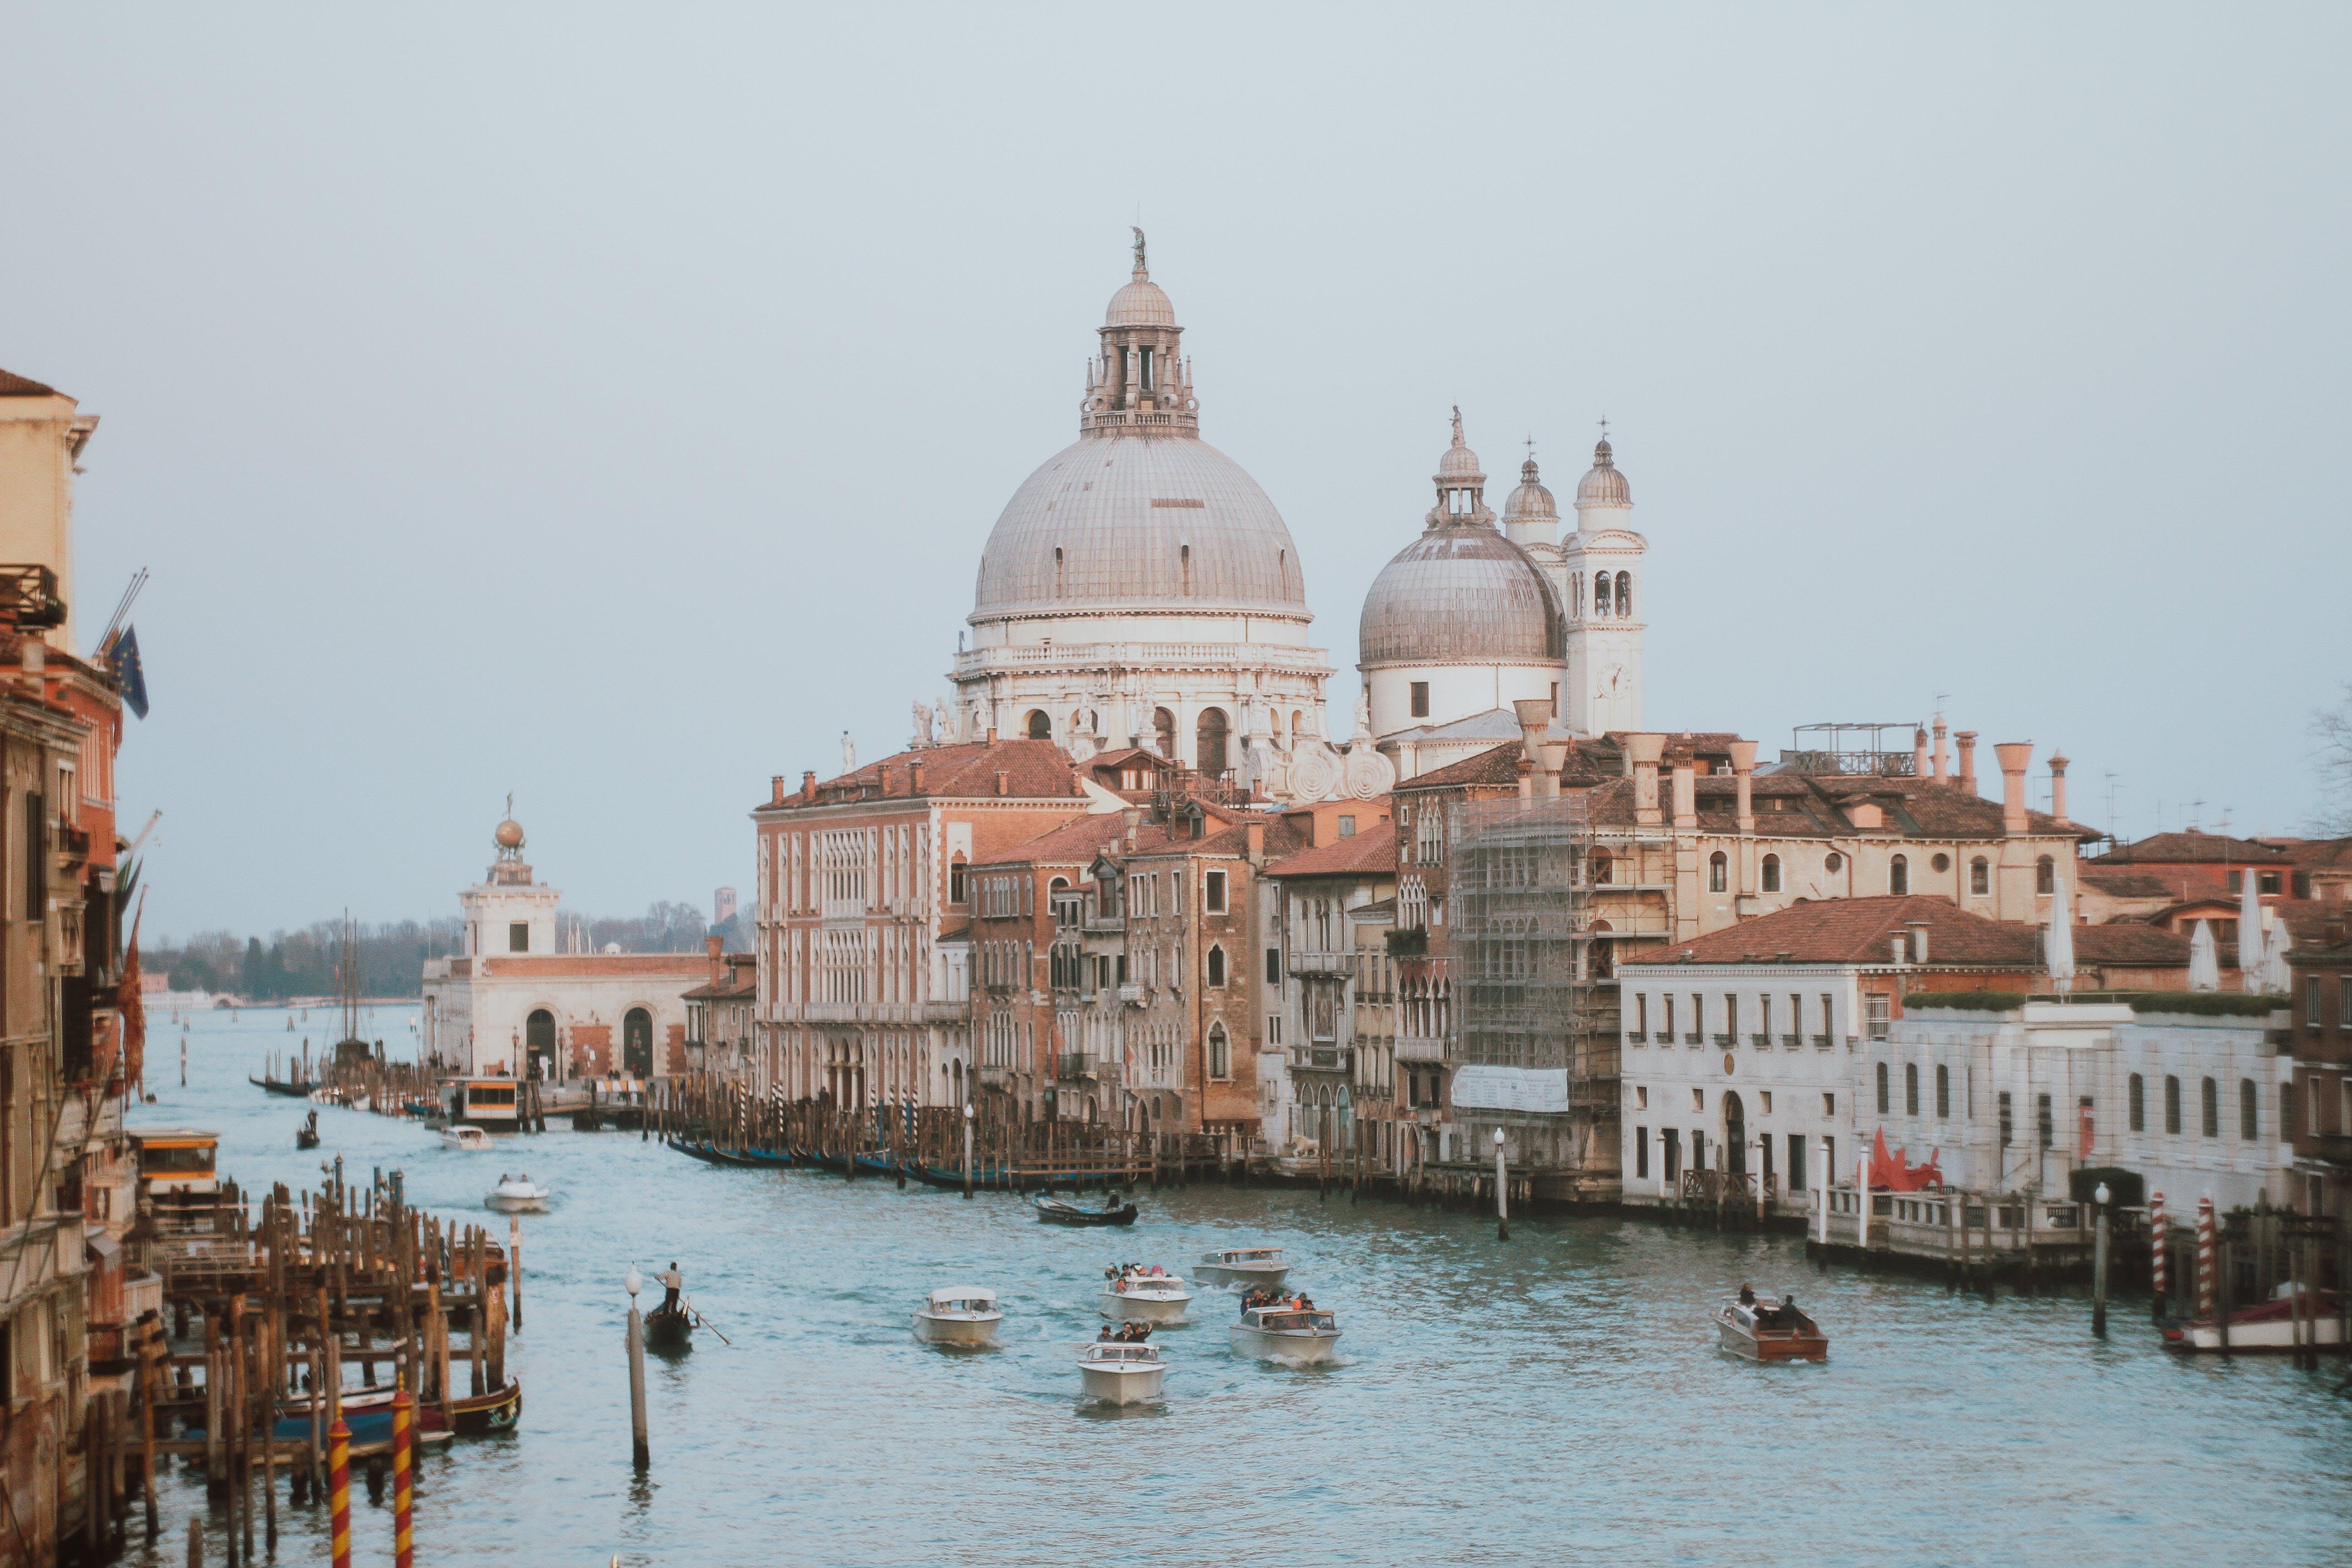 Kostenloses Stock Foto zu architektur, ferien, gondel, italien